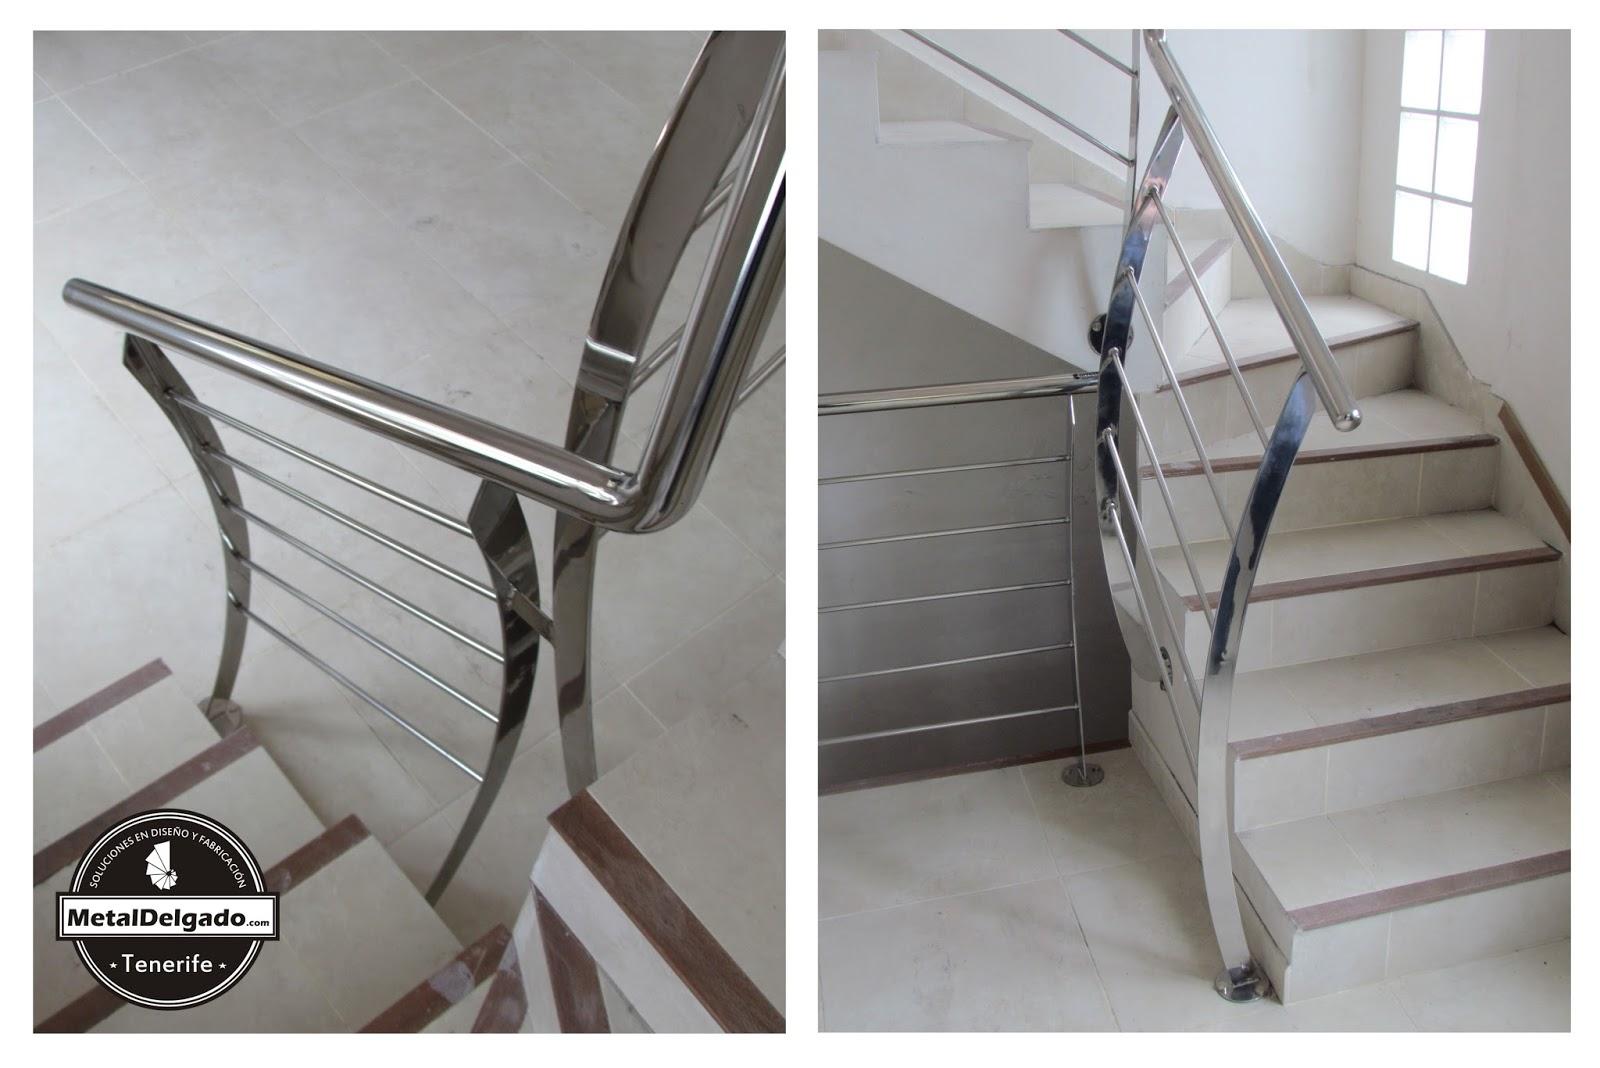 Acero inoxidable tenerife barandas acero inoxidable para for Barandas de escalera